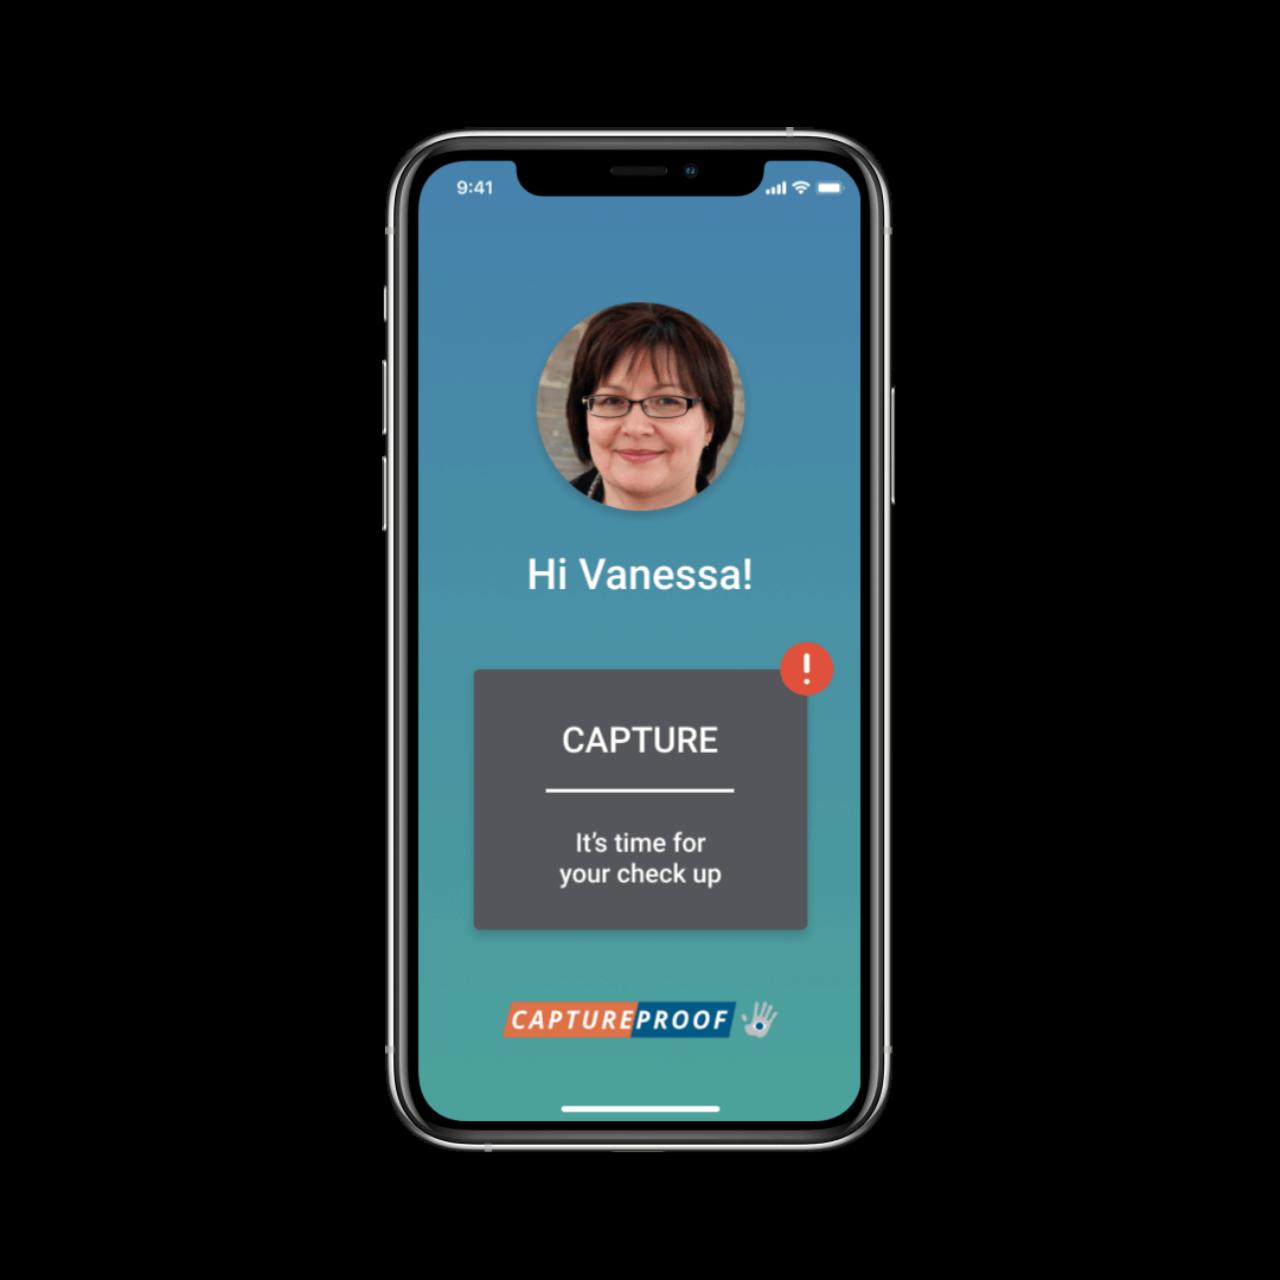 CAPTUREPROOF Telemedicine App Greeting Screen